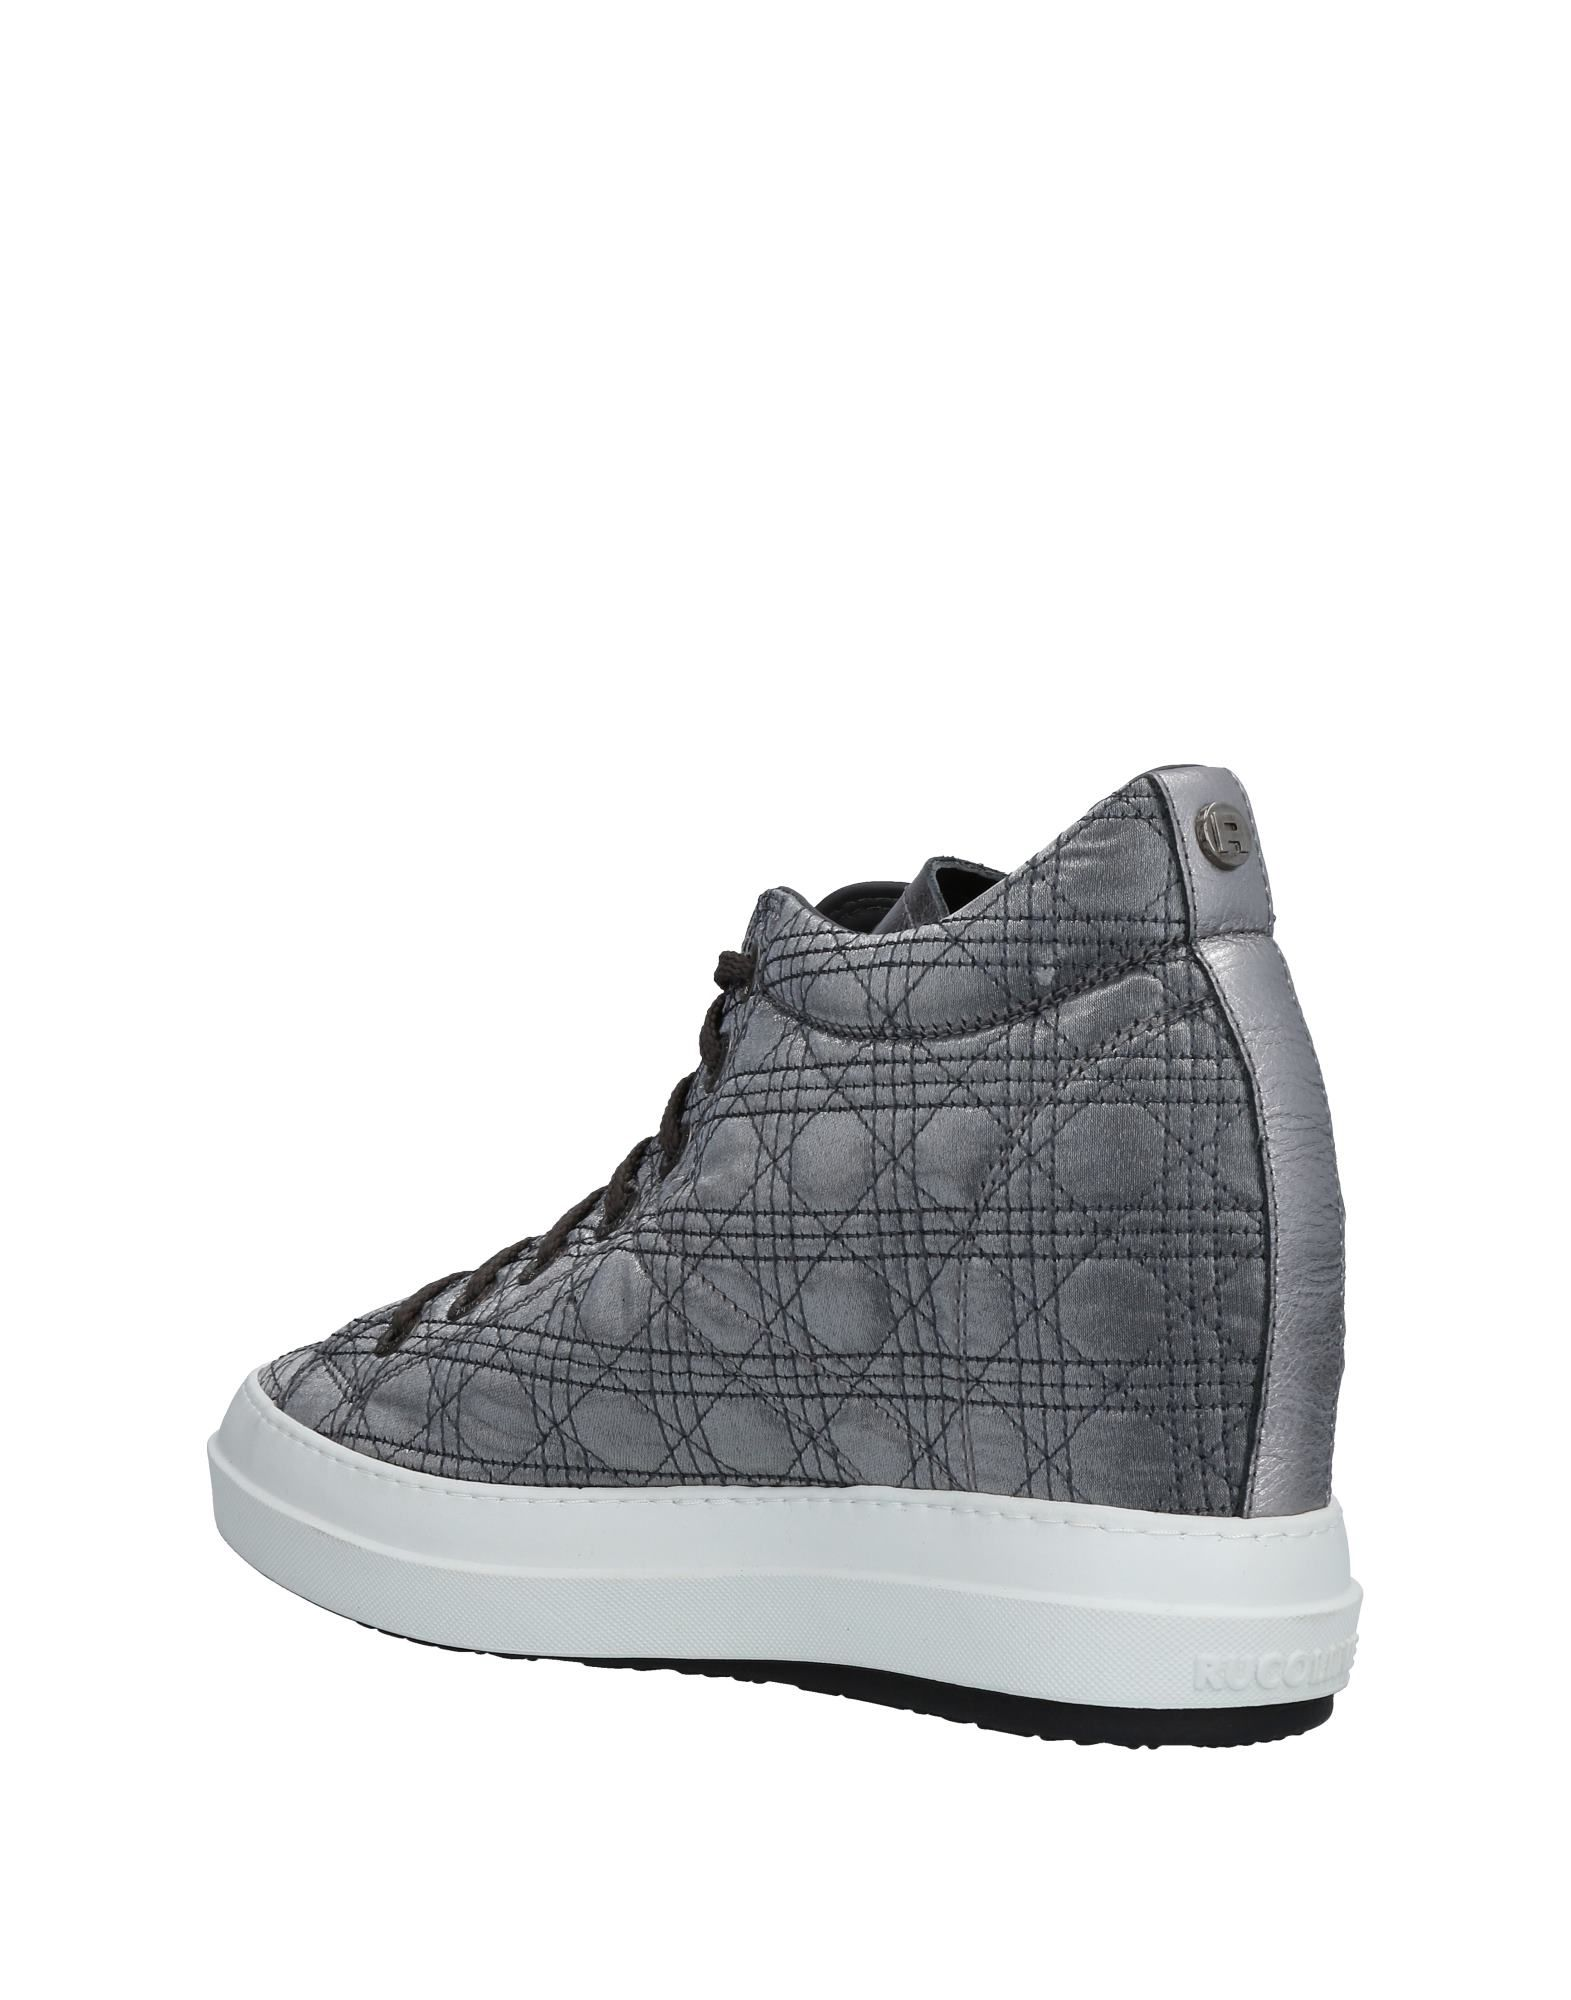 Ruco 11477265WJ Line Sneakers Damen  11477265WJ Ruco Gute Qualität beliebte Schuhe 5e2040